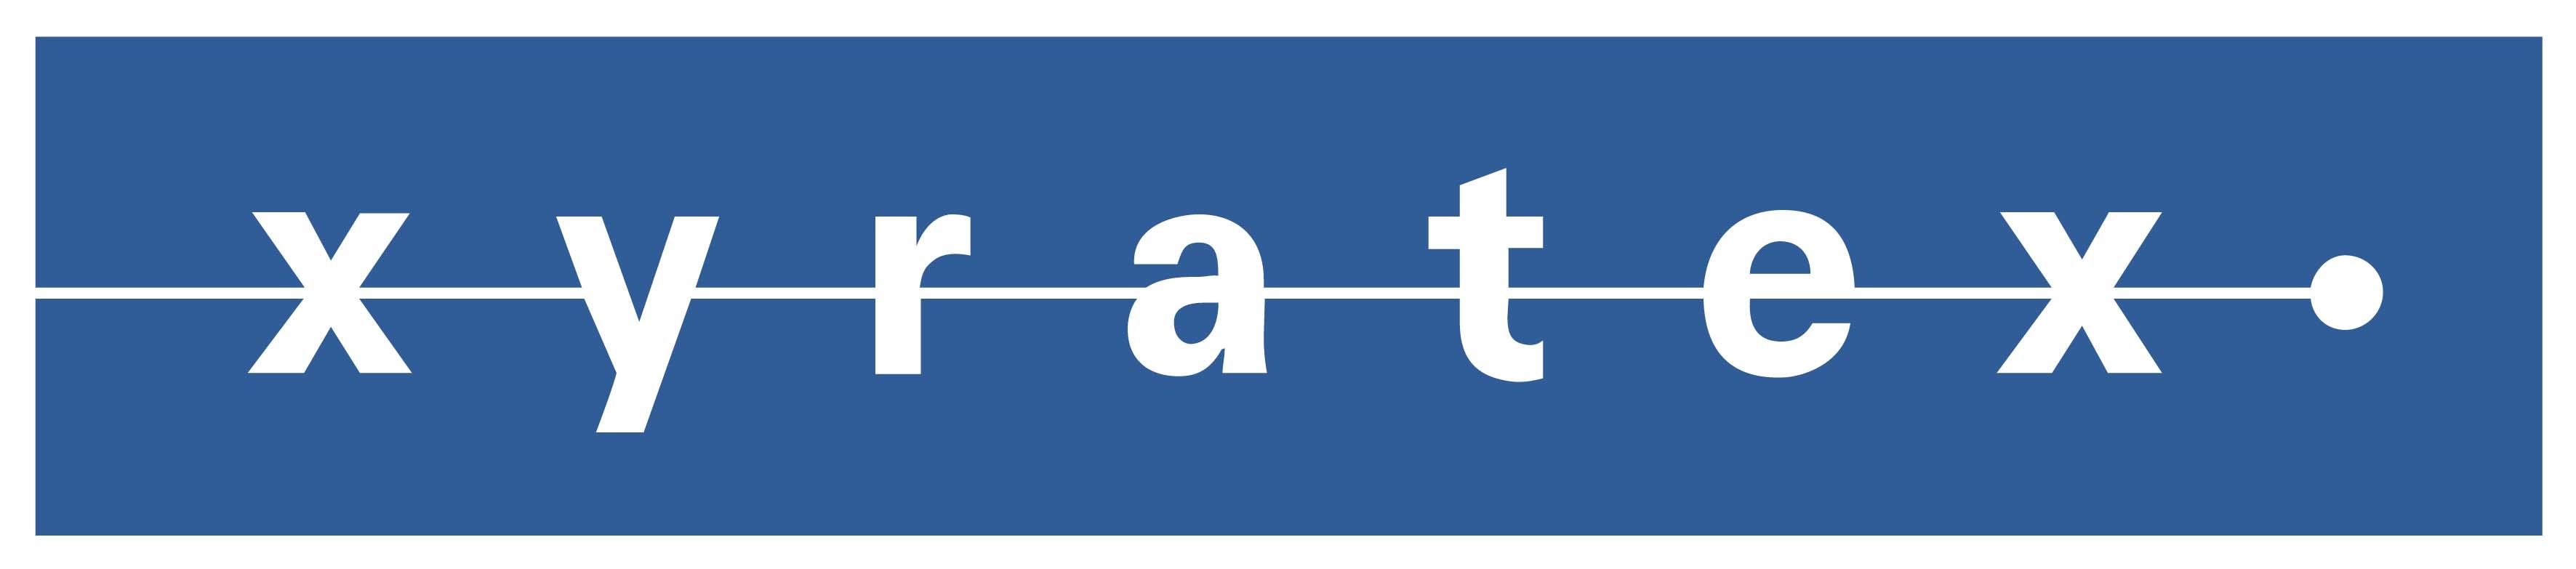 Xyratex logo